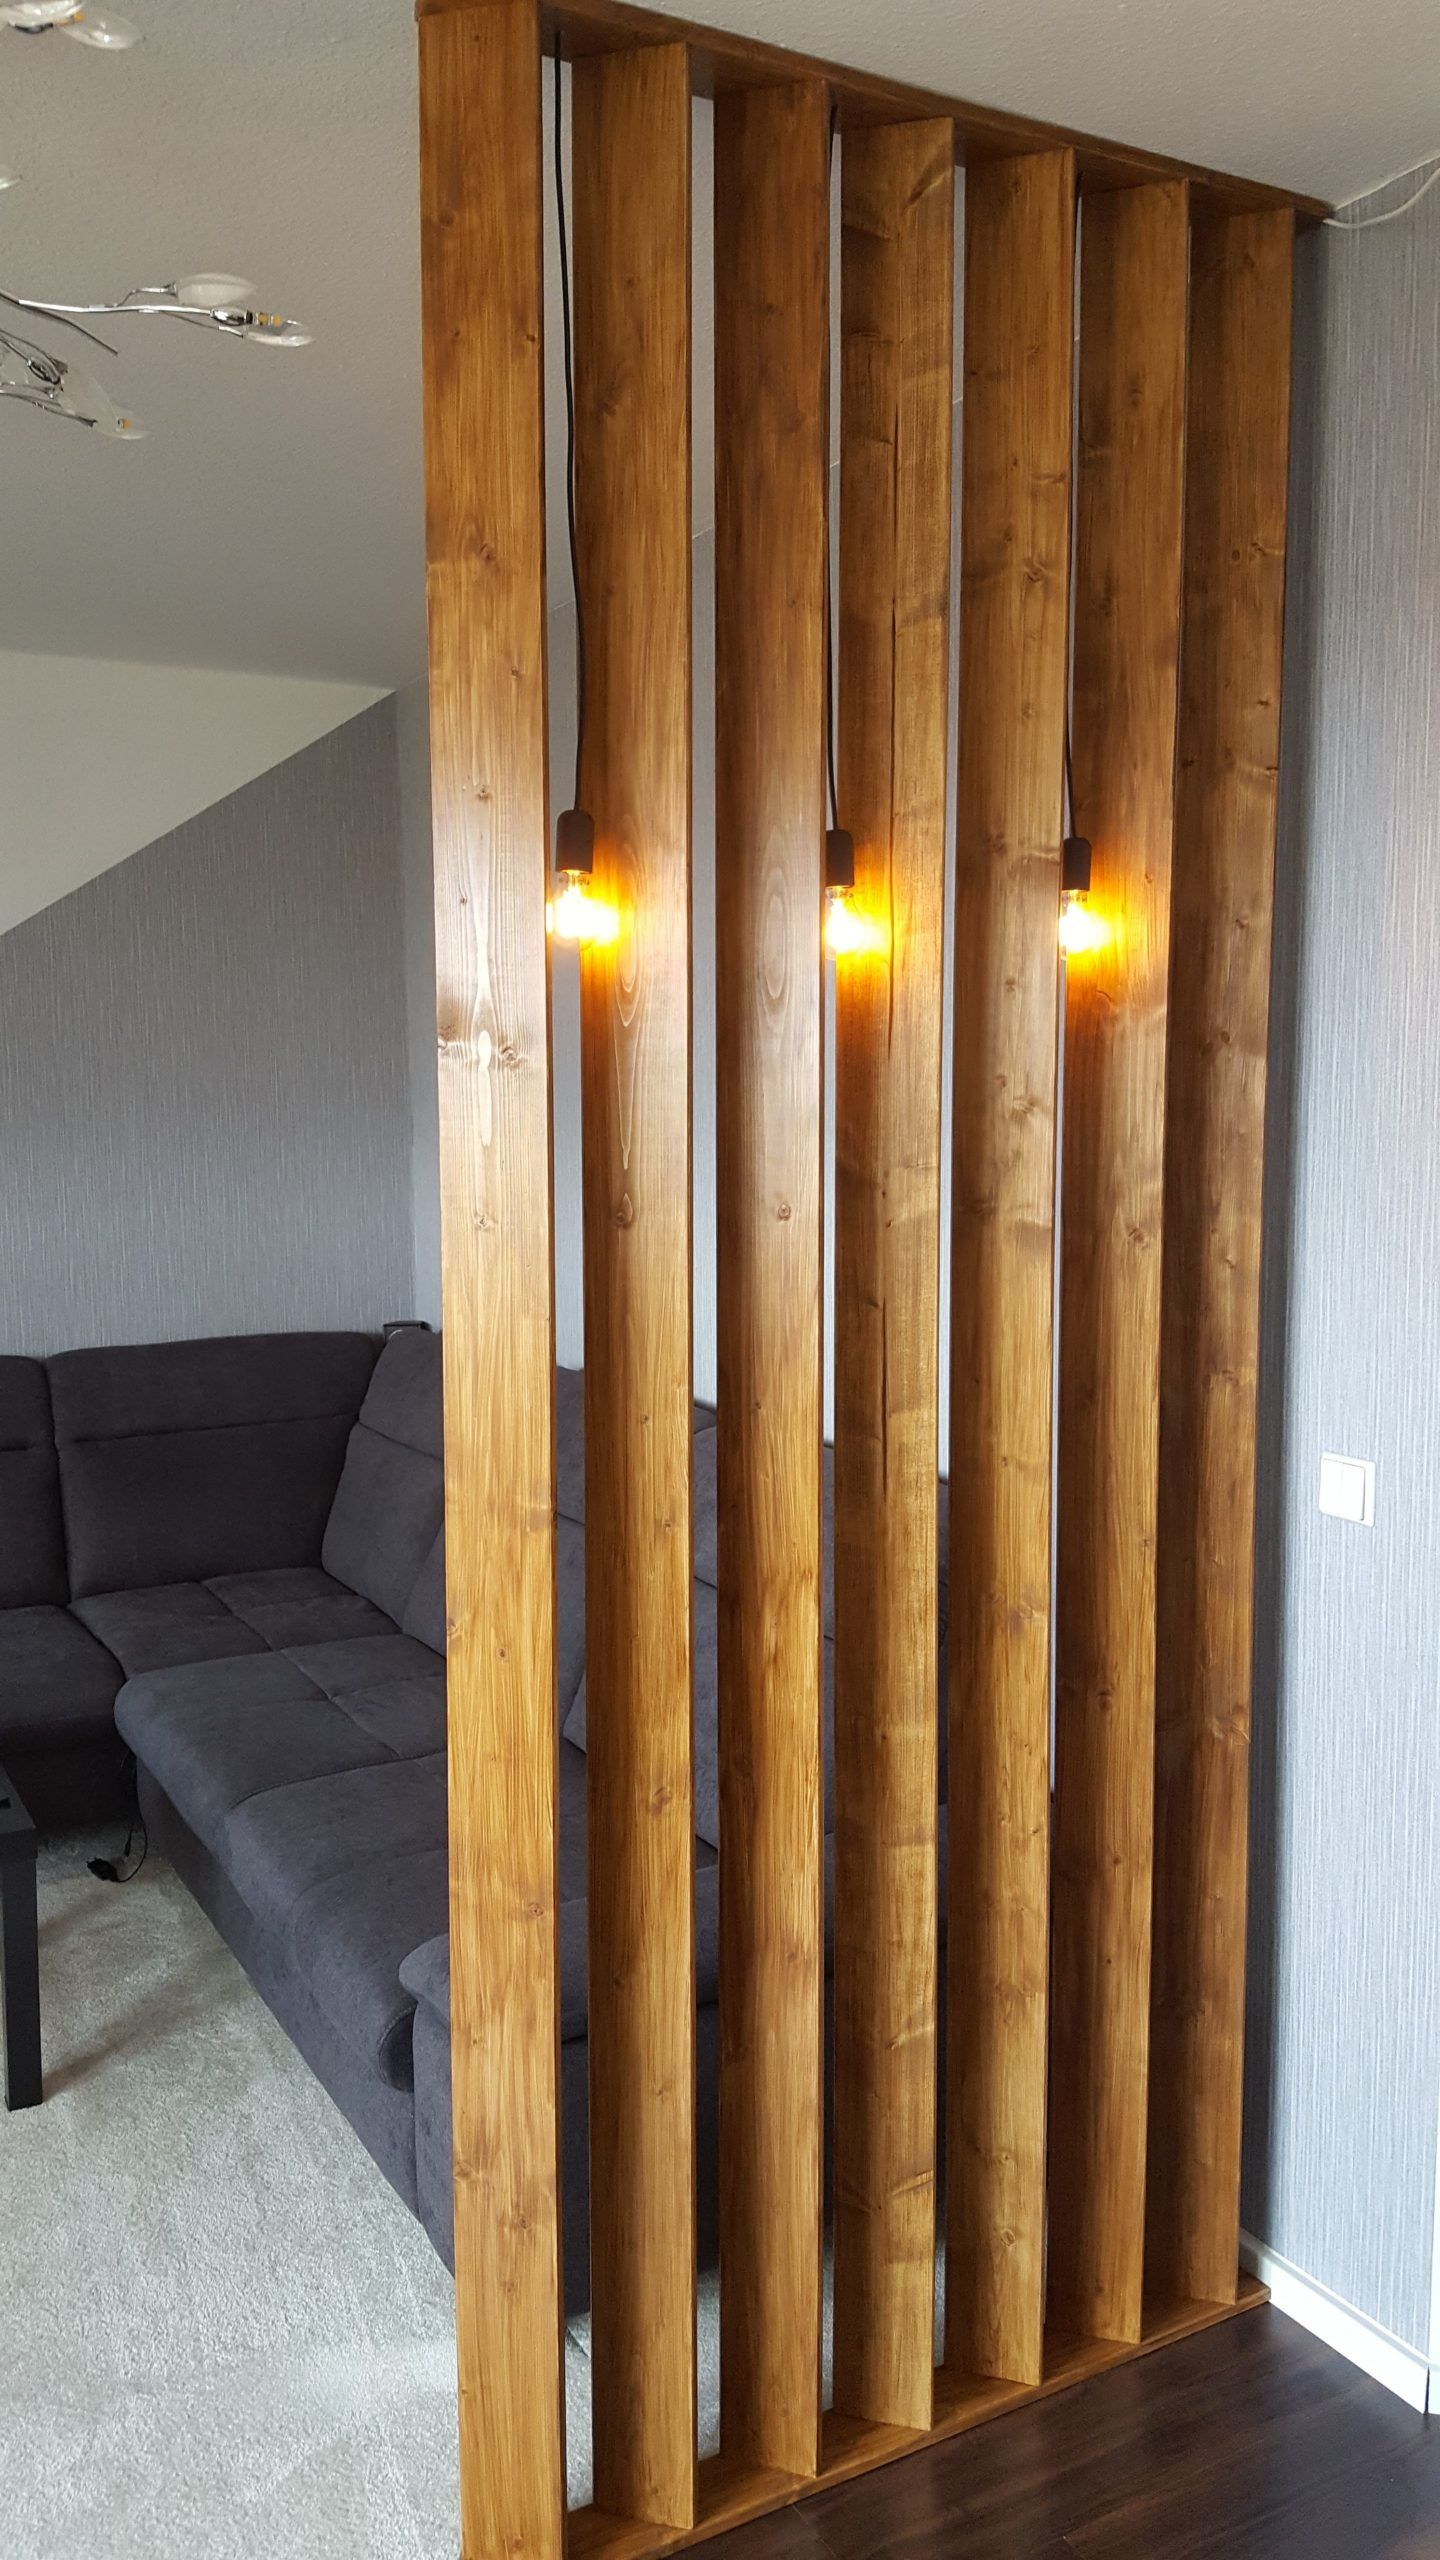 Raumteiler Holz, #Holz #Raumteiler in 17  Raumteiler holz